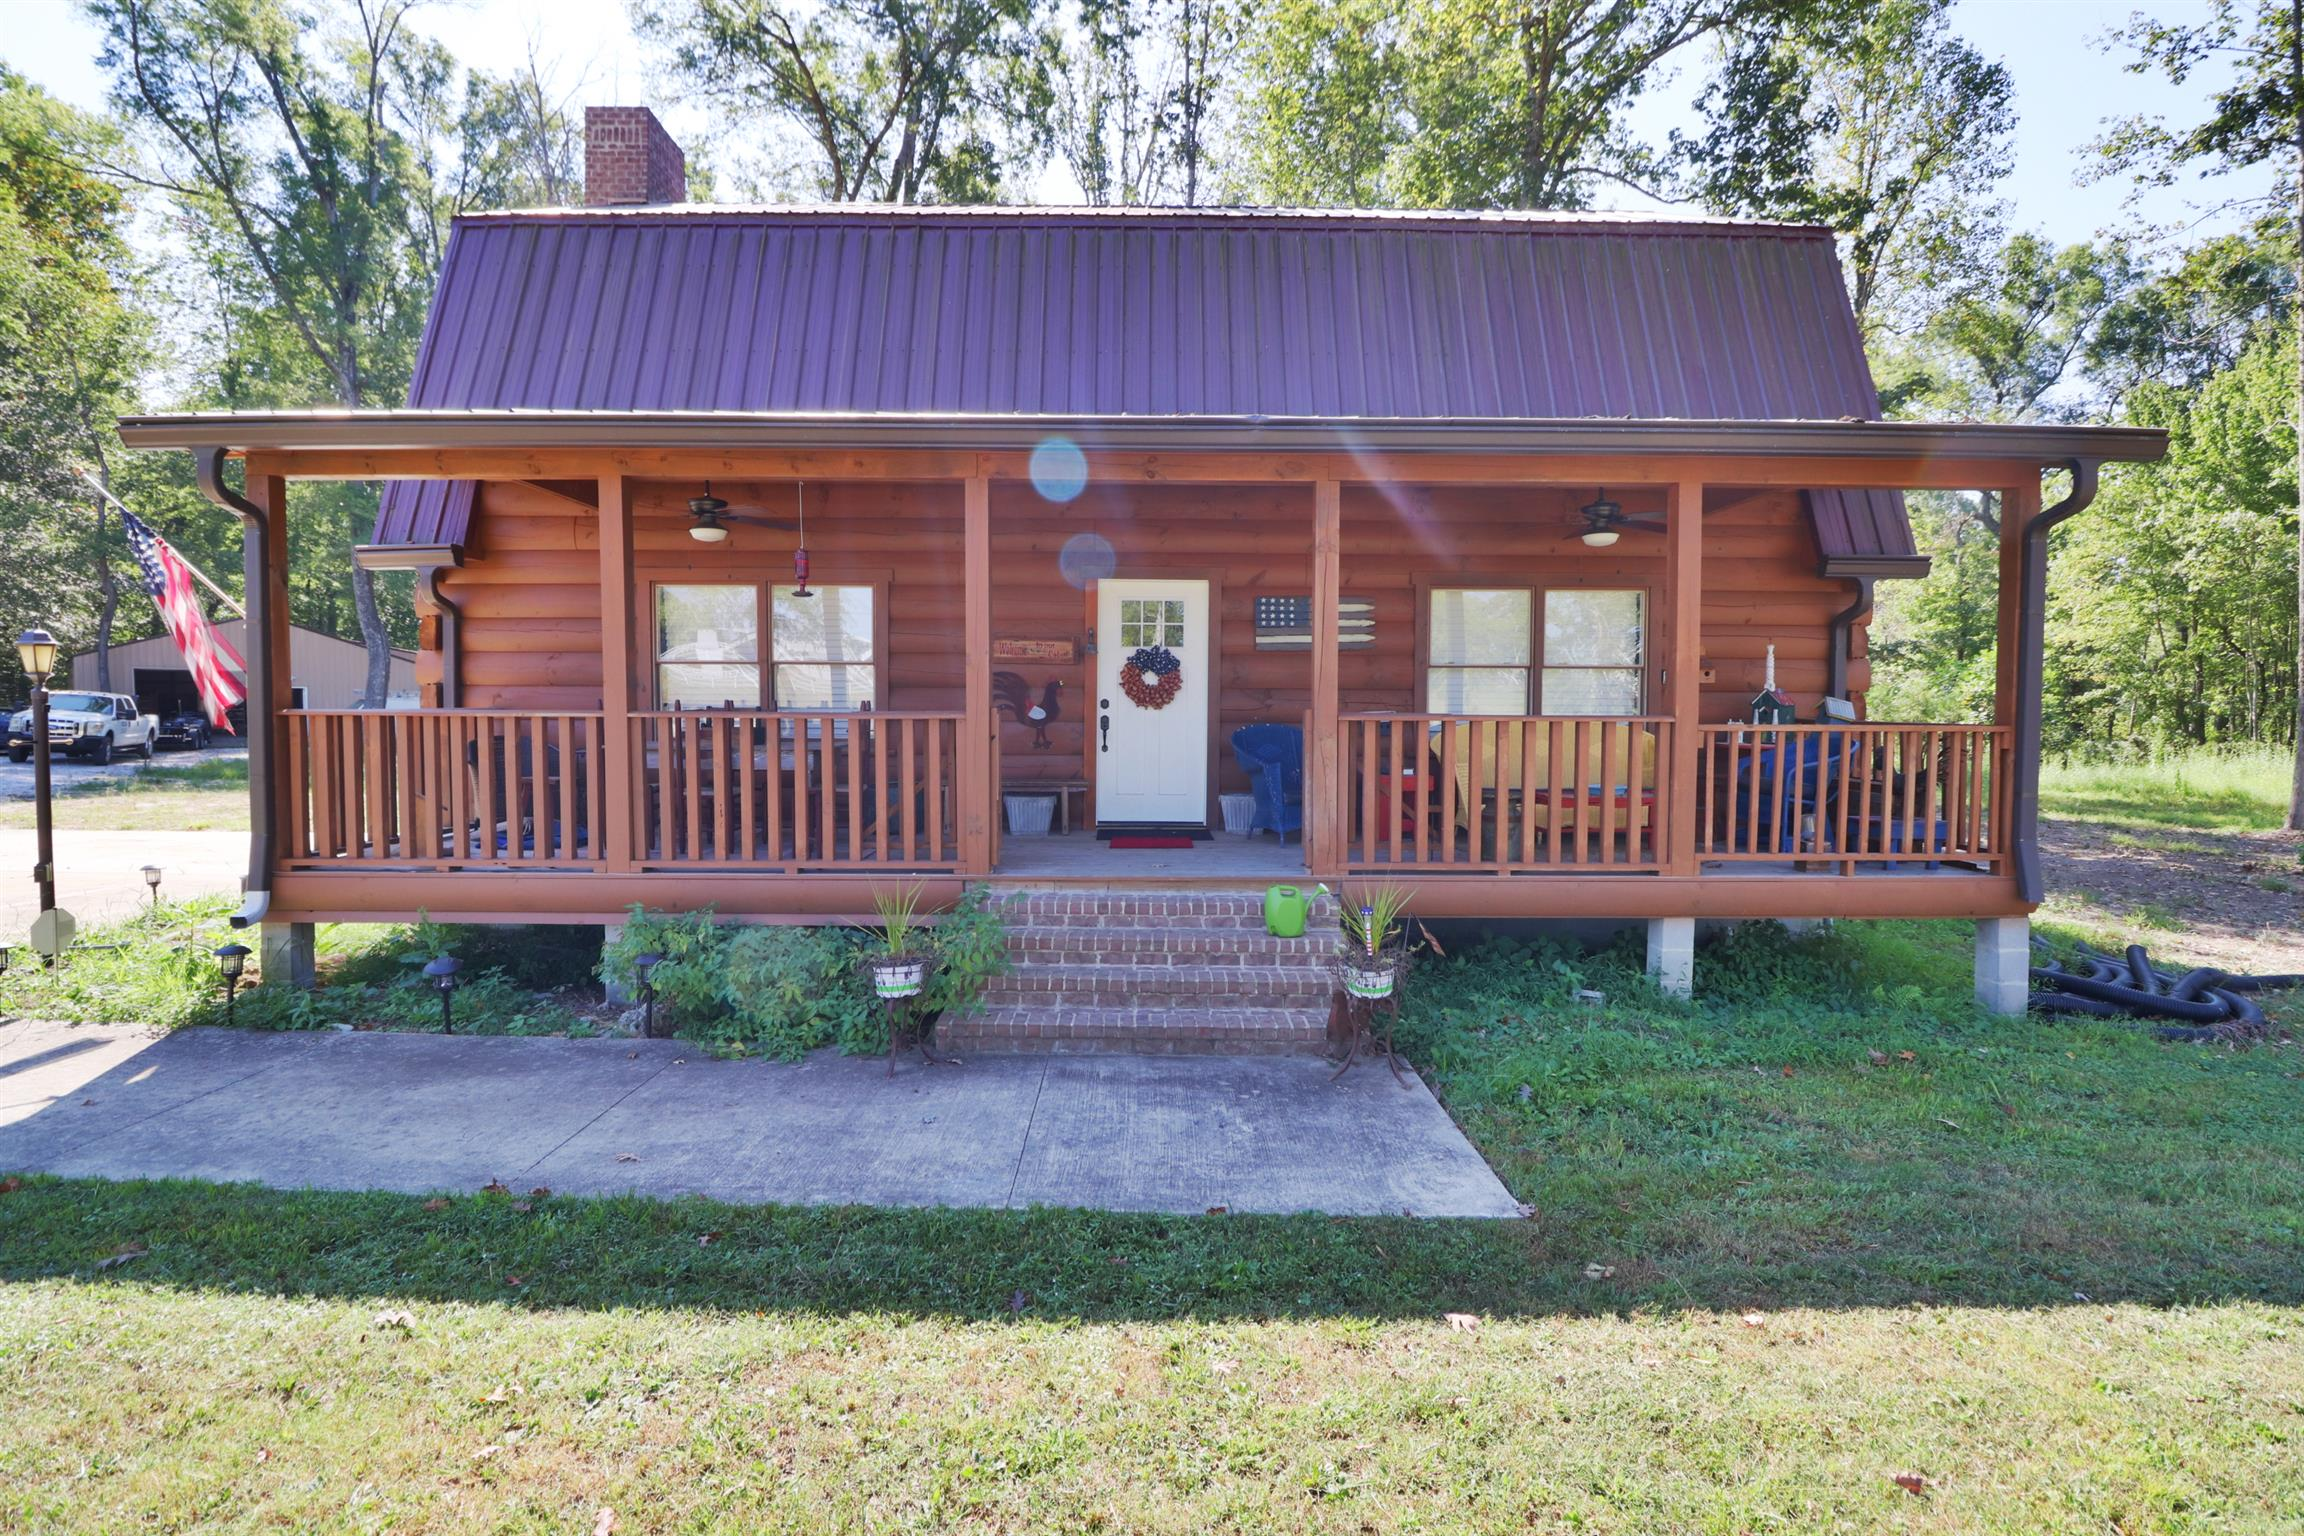 959 Ferrells Loop Rd, Beechgrove, TN 37018 - Beechgrove, TN real estate listing